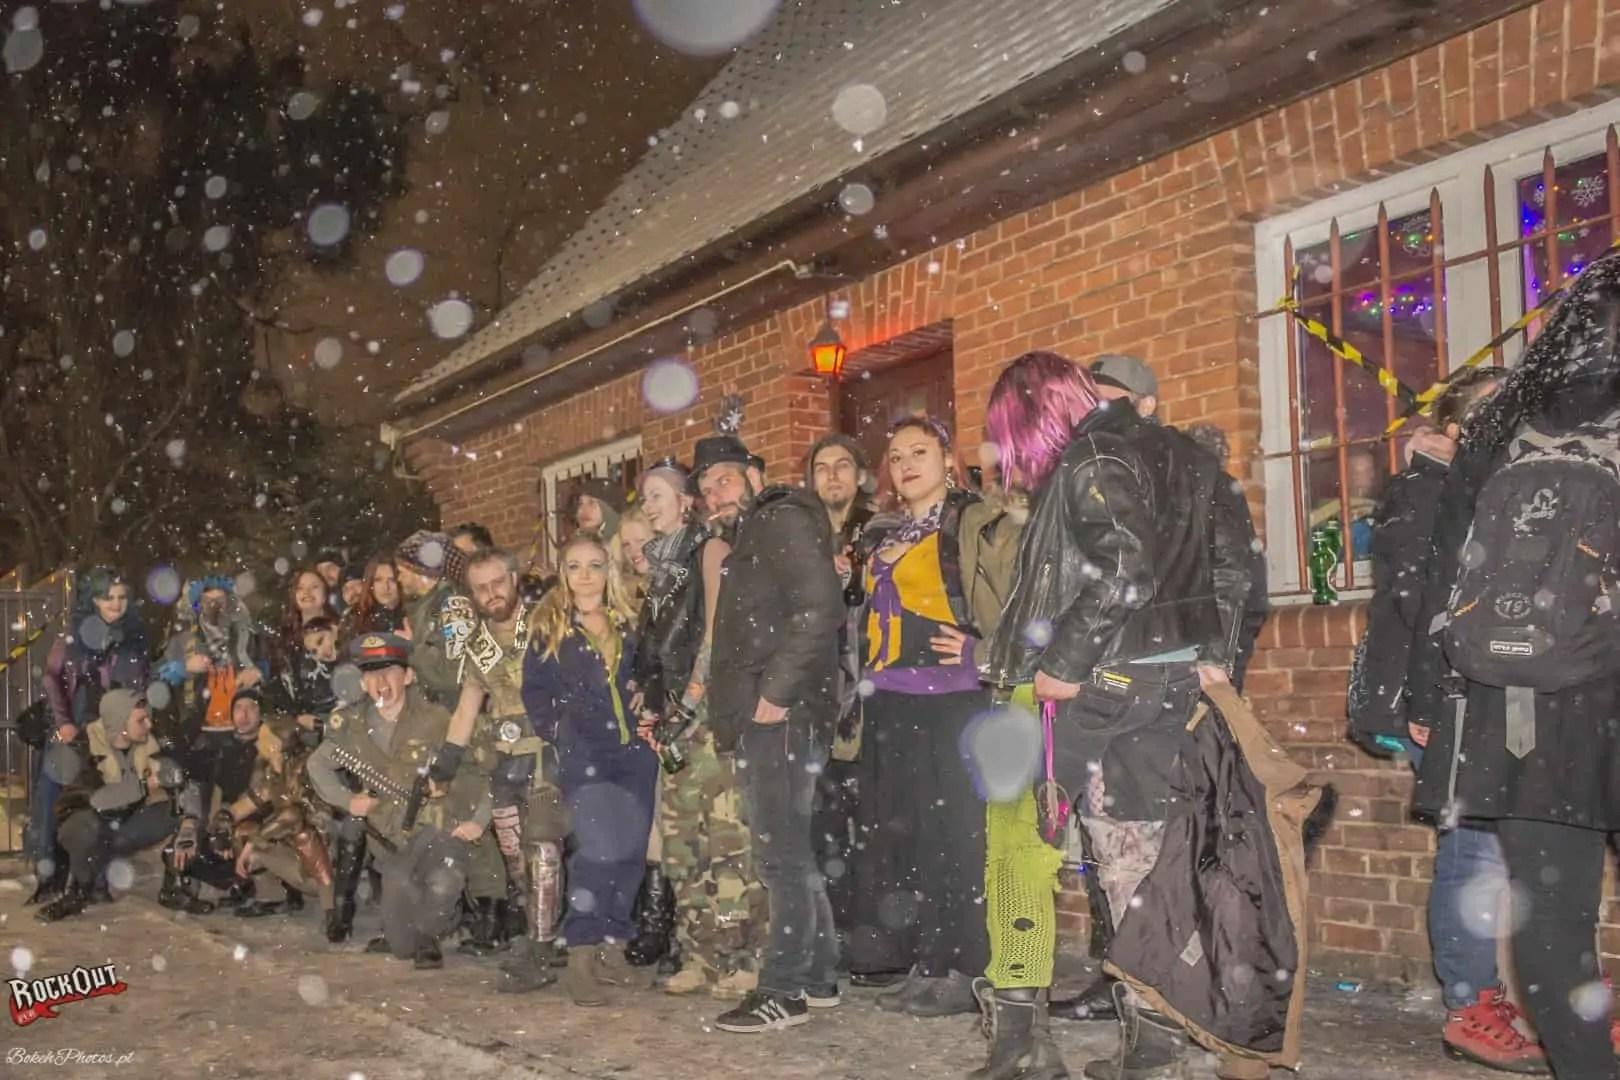 RockOut OldTown Pubbing BokehPhotosPL 44 - Reportaż wydarzeń, koncerty